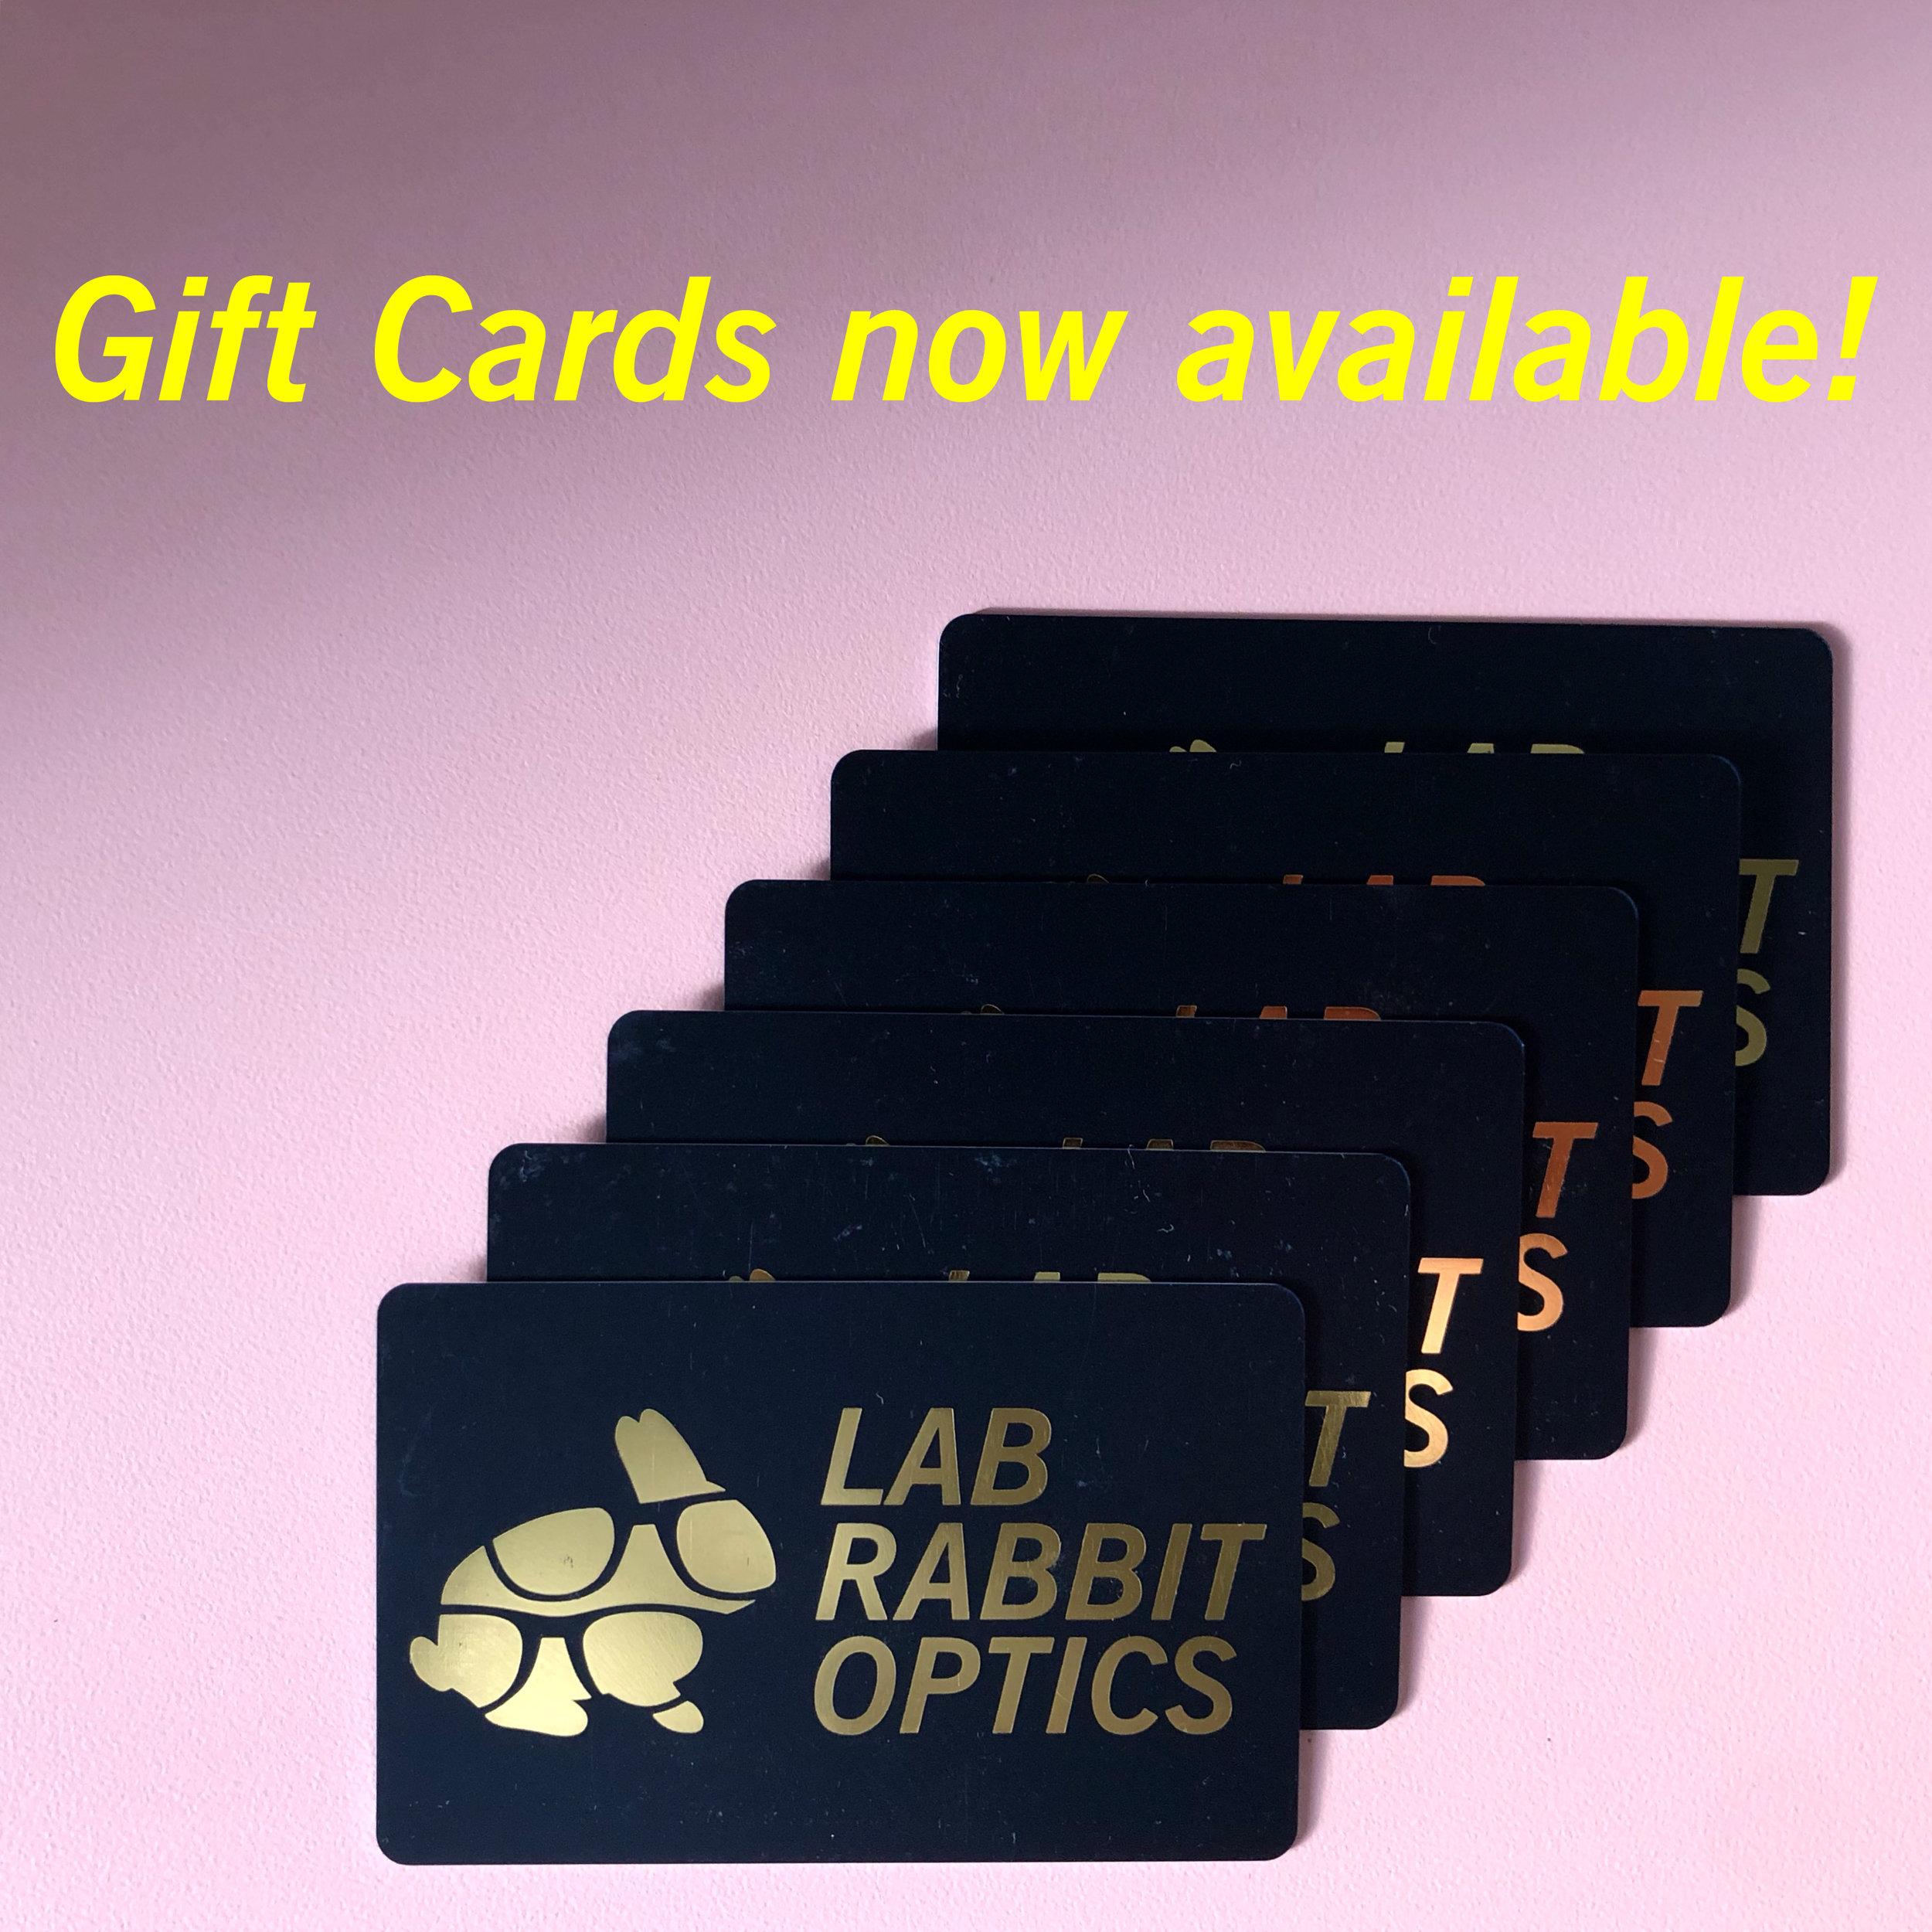 lab-rabbit-optics-gift-card-holiday-idea-2.jpg